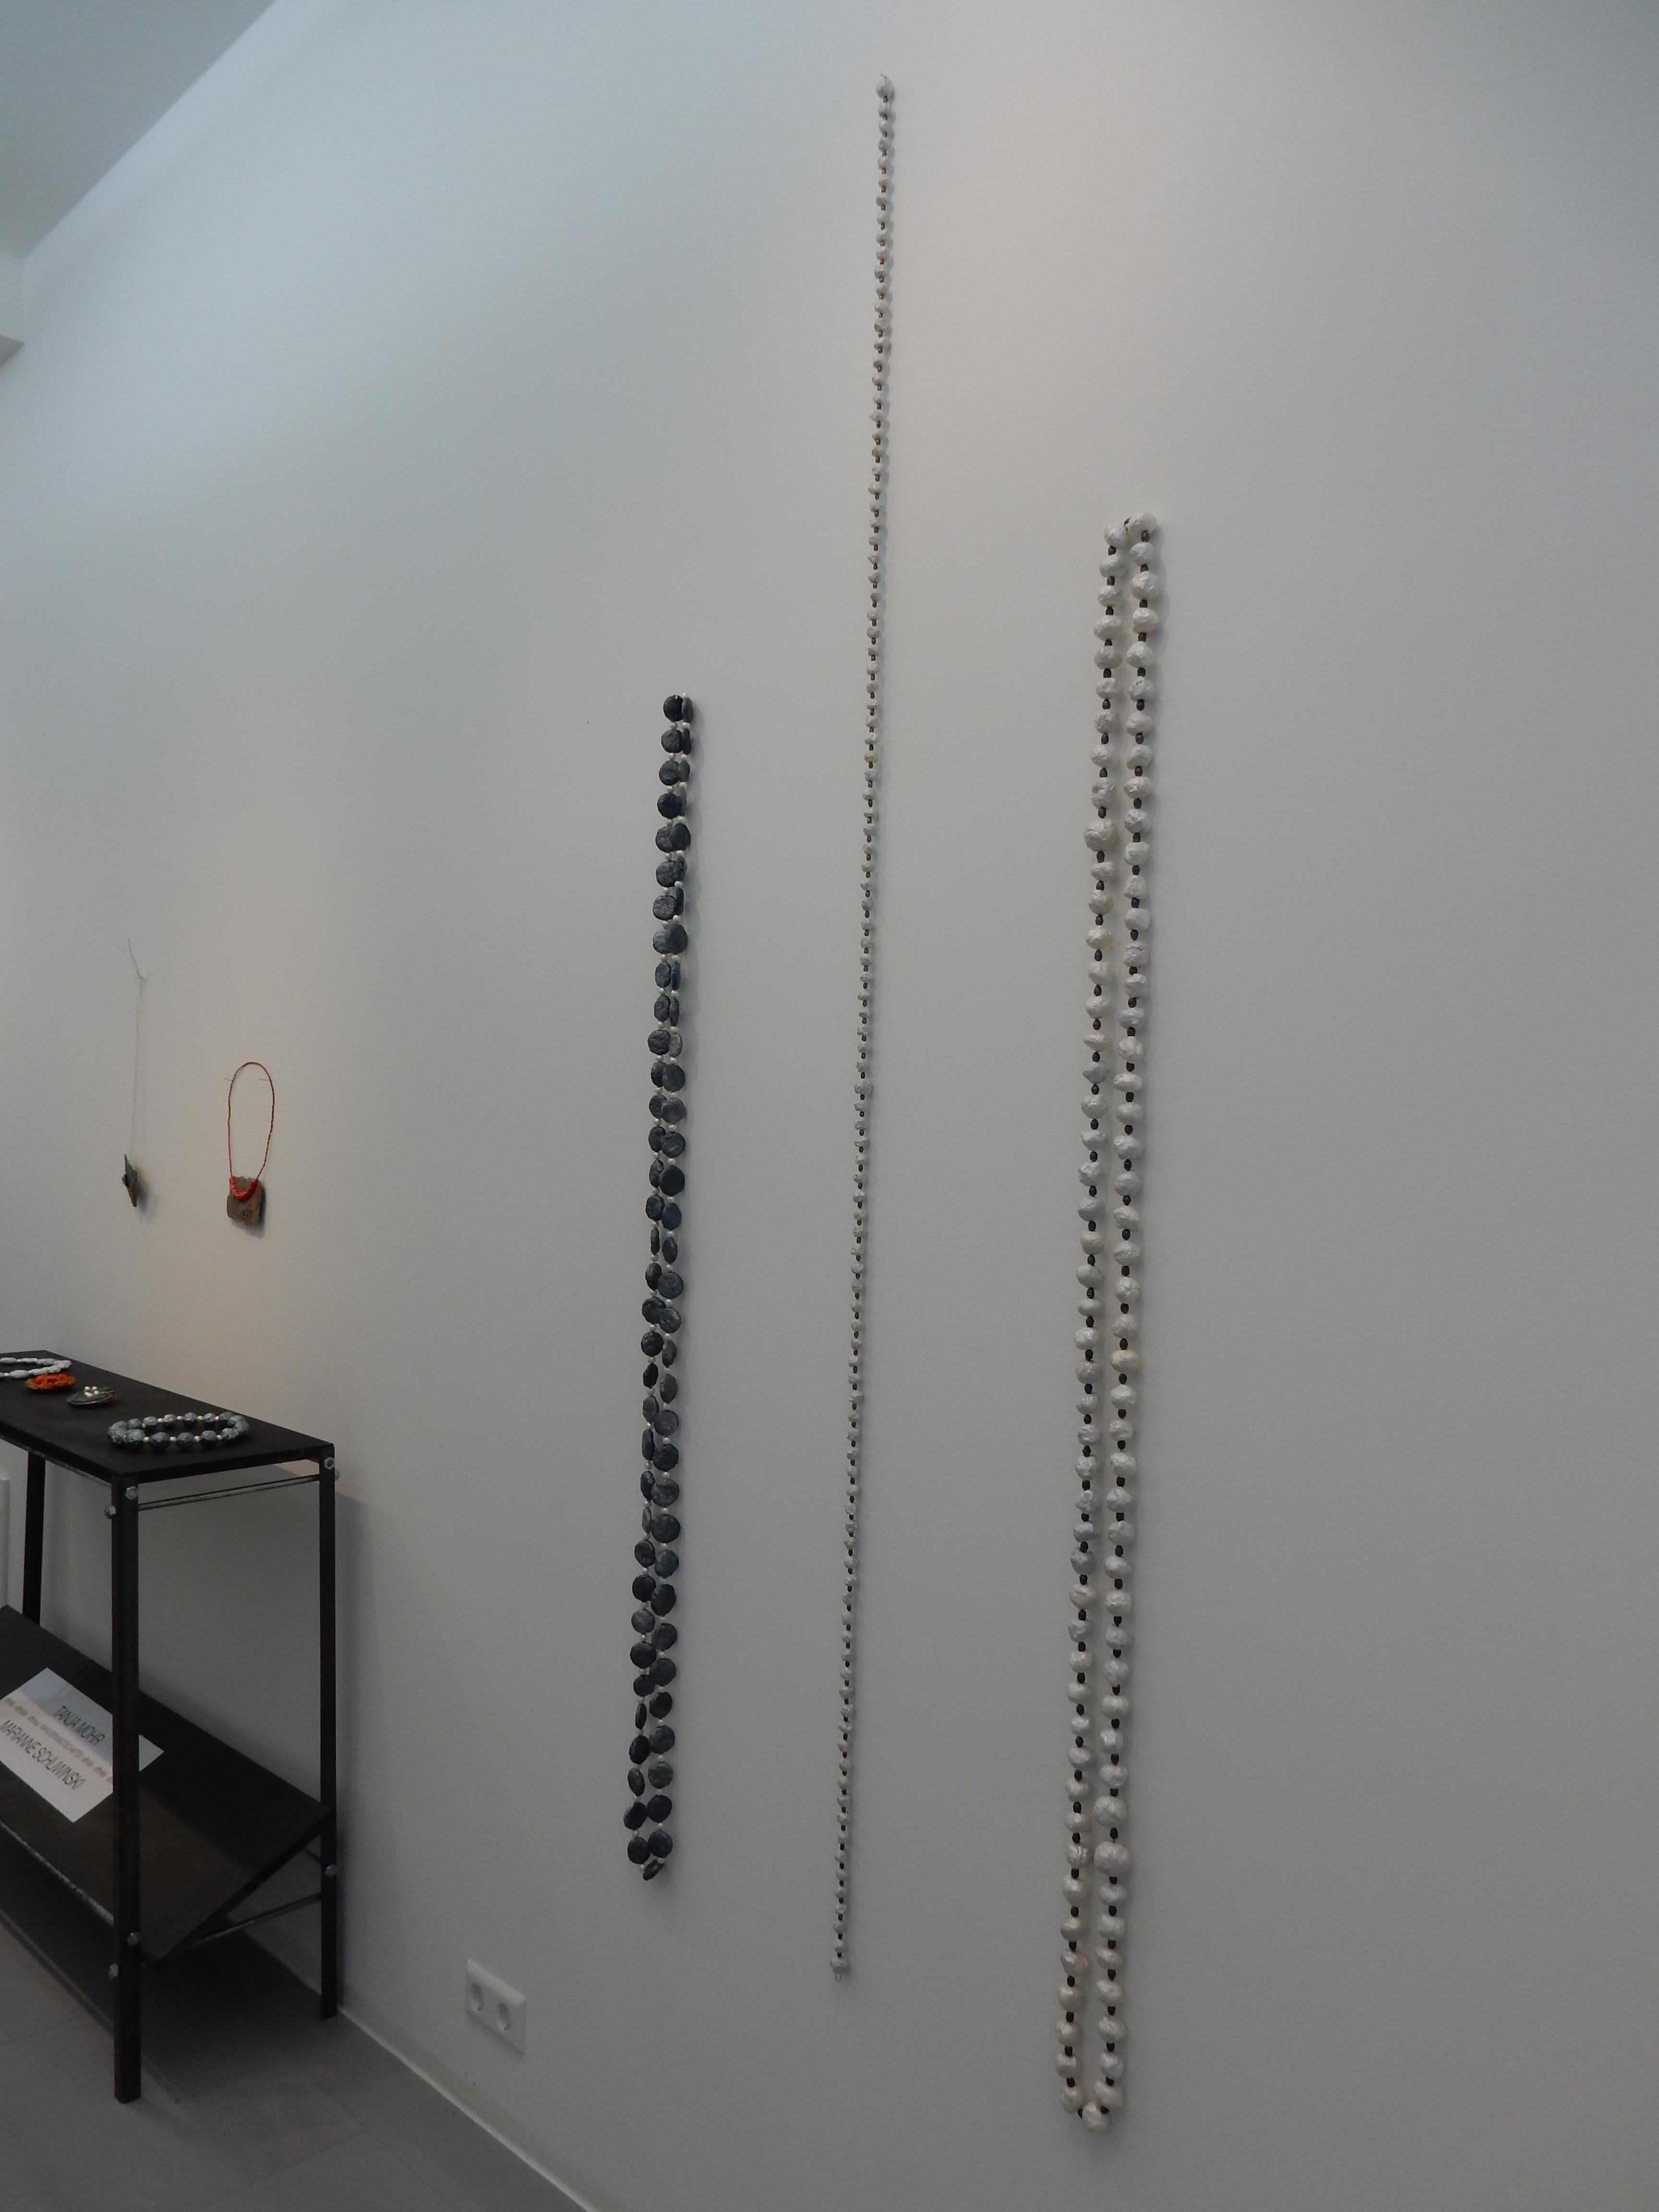 Marianne Schliwinski in Galerie Spektrum, Karlsruhe. Foto Coert Peter Krabbe, september 2018, CC BY 4.0